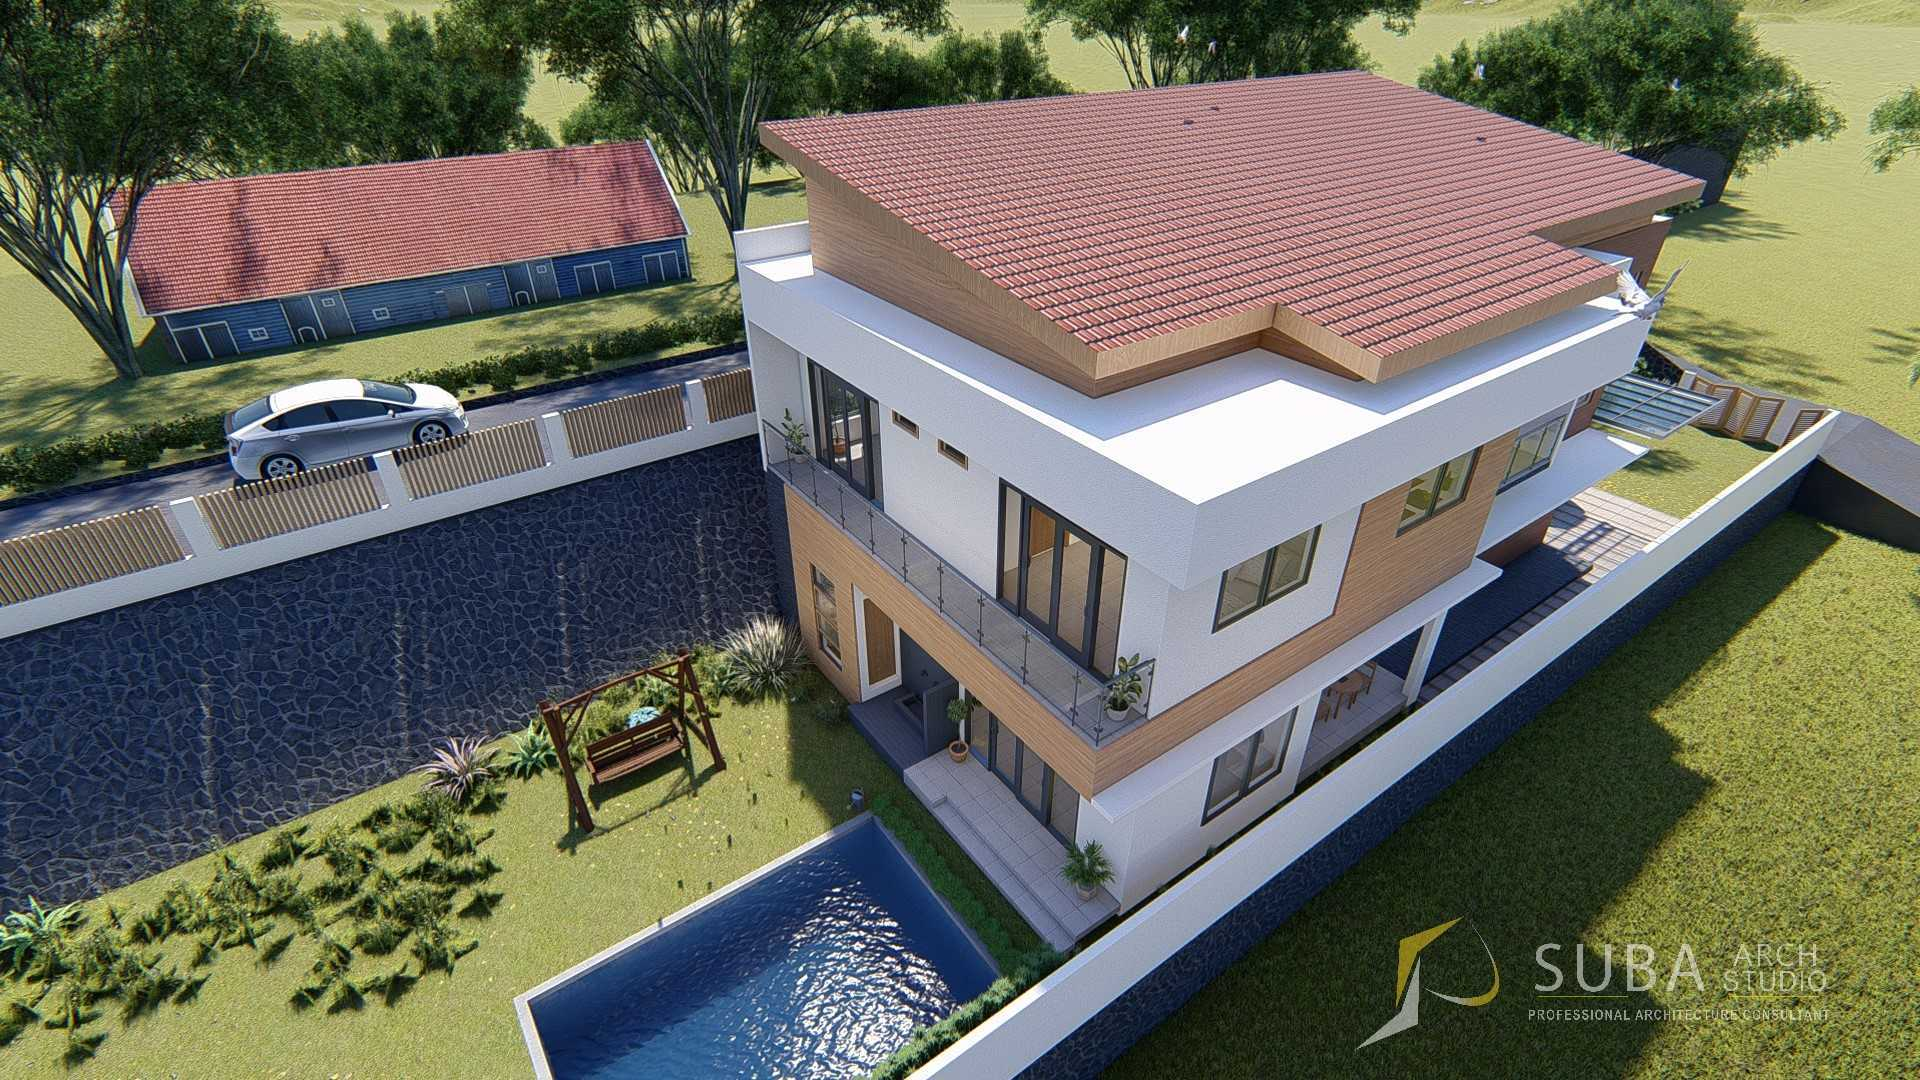 Suba-Arch Desain Rencana Rumah Tinggal 2Lt 13 X 17 @bu Wita Padang, Kota Padang, Sumatera Barat, Indonesia Padang, Kota Padang, Sumatera Barat, Indonesia Suba-Arch-Desain-Rencana-Rumah-Tinggal-2Lt-13-X-17-Bu-Wita  86843